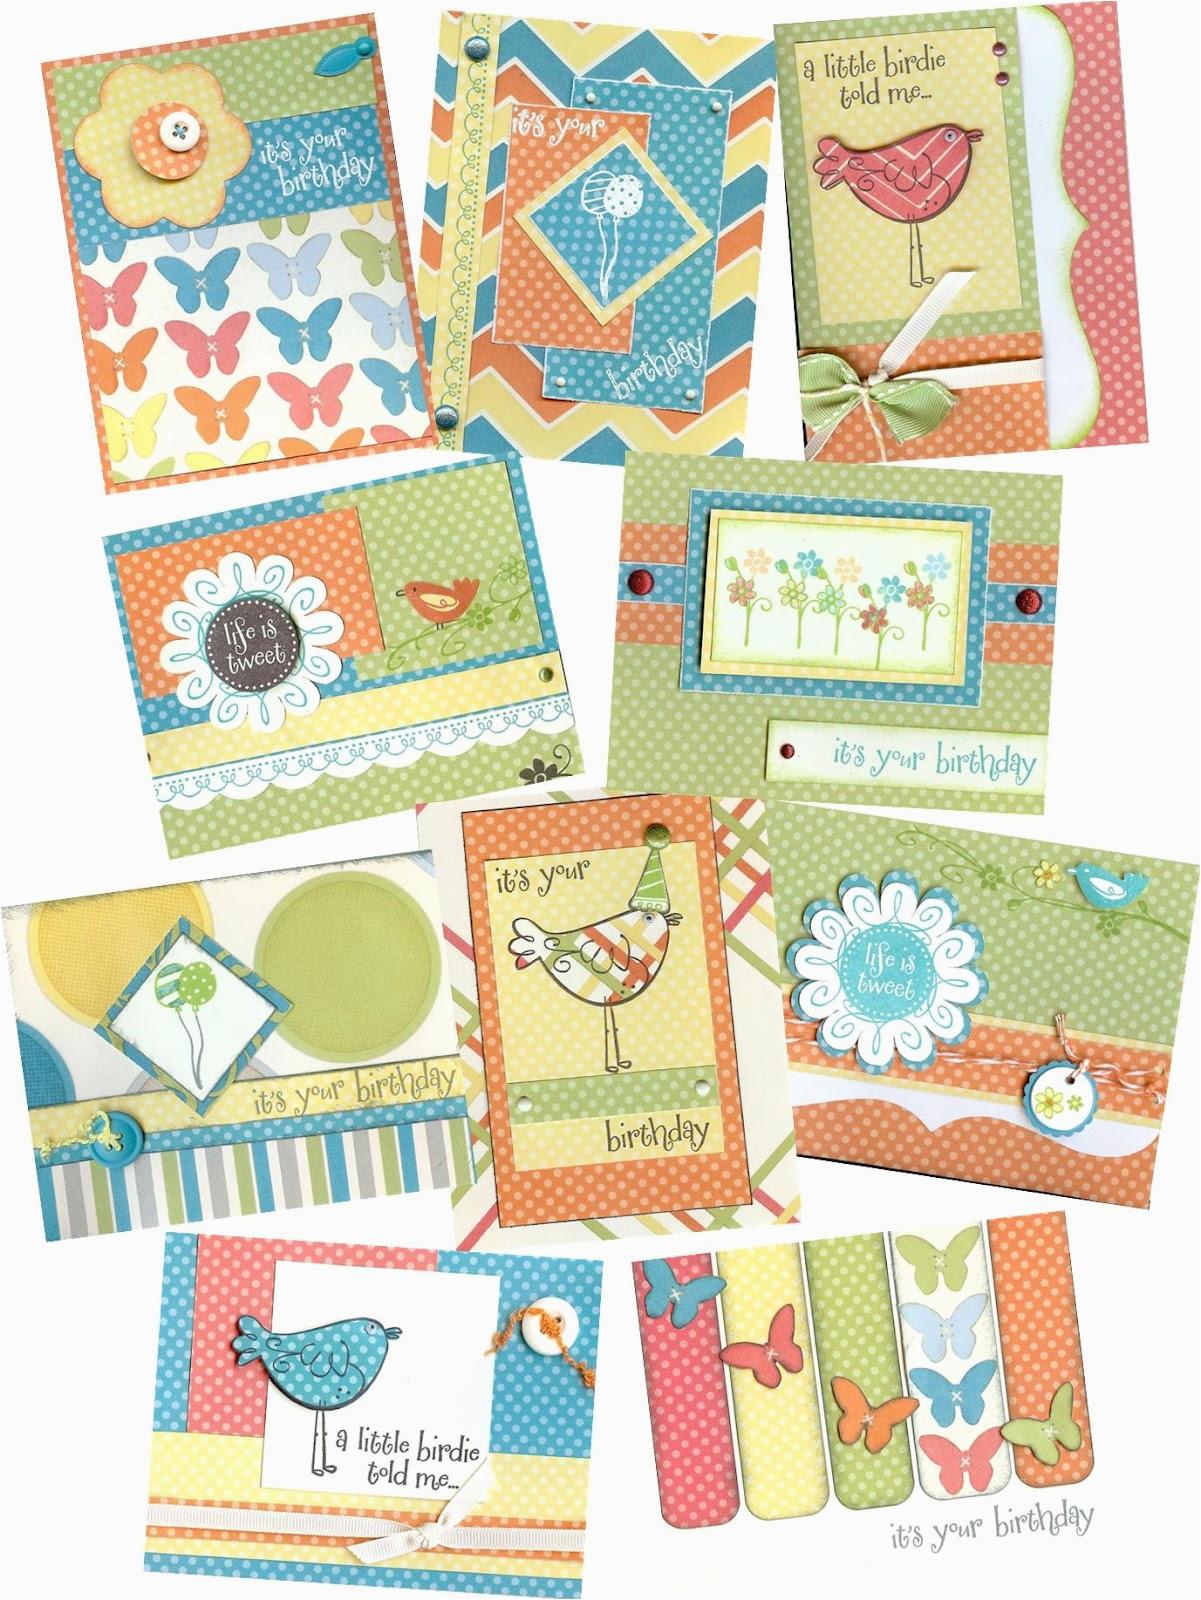 kimberly thomas papercrafter 20 card mail order kits